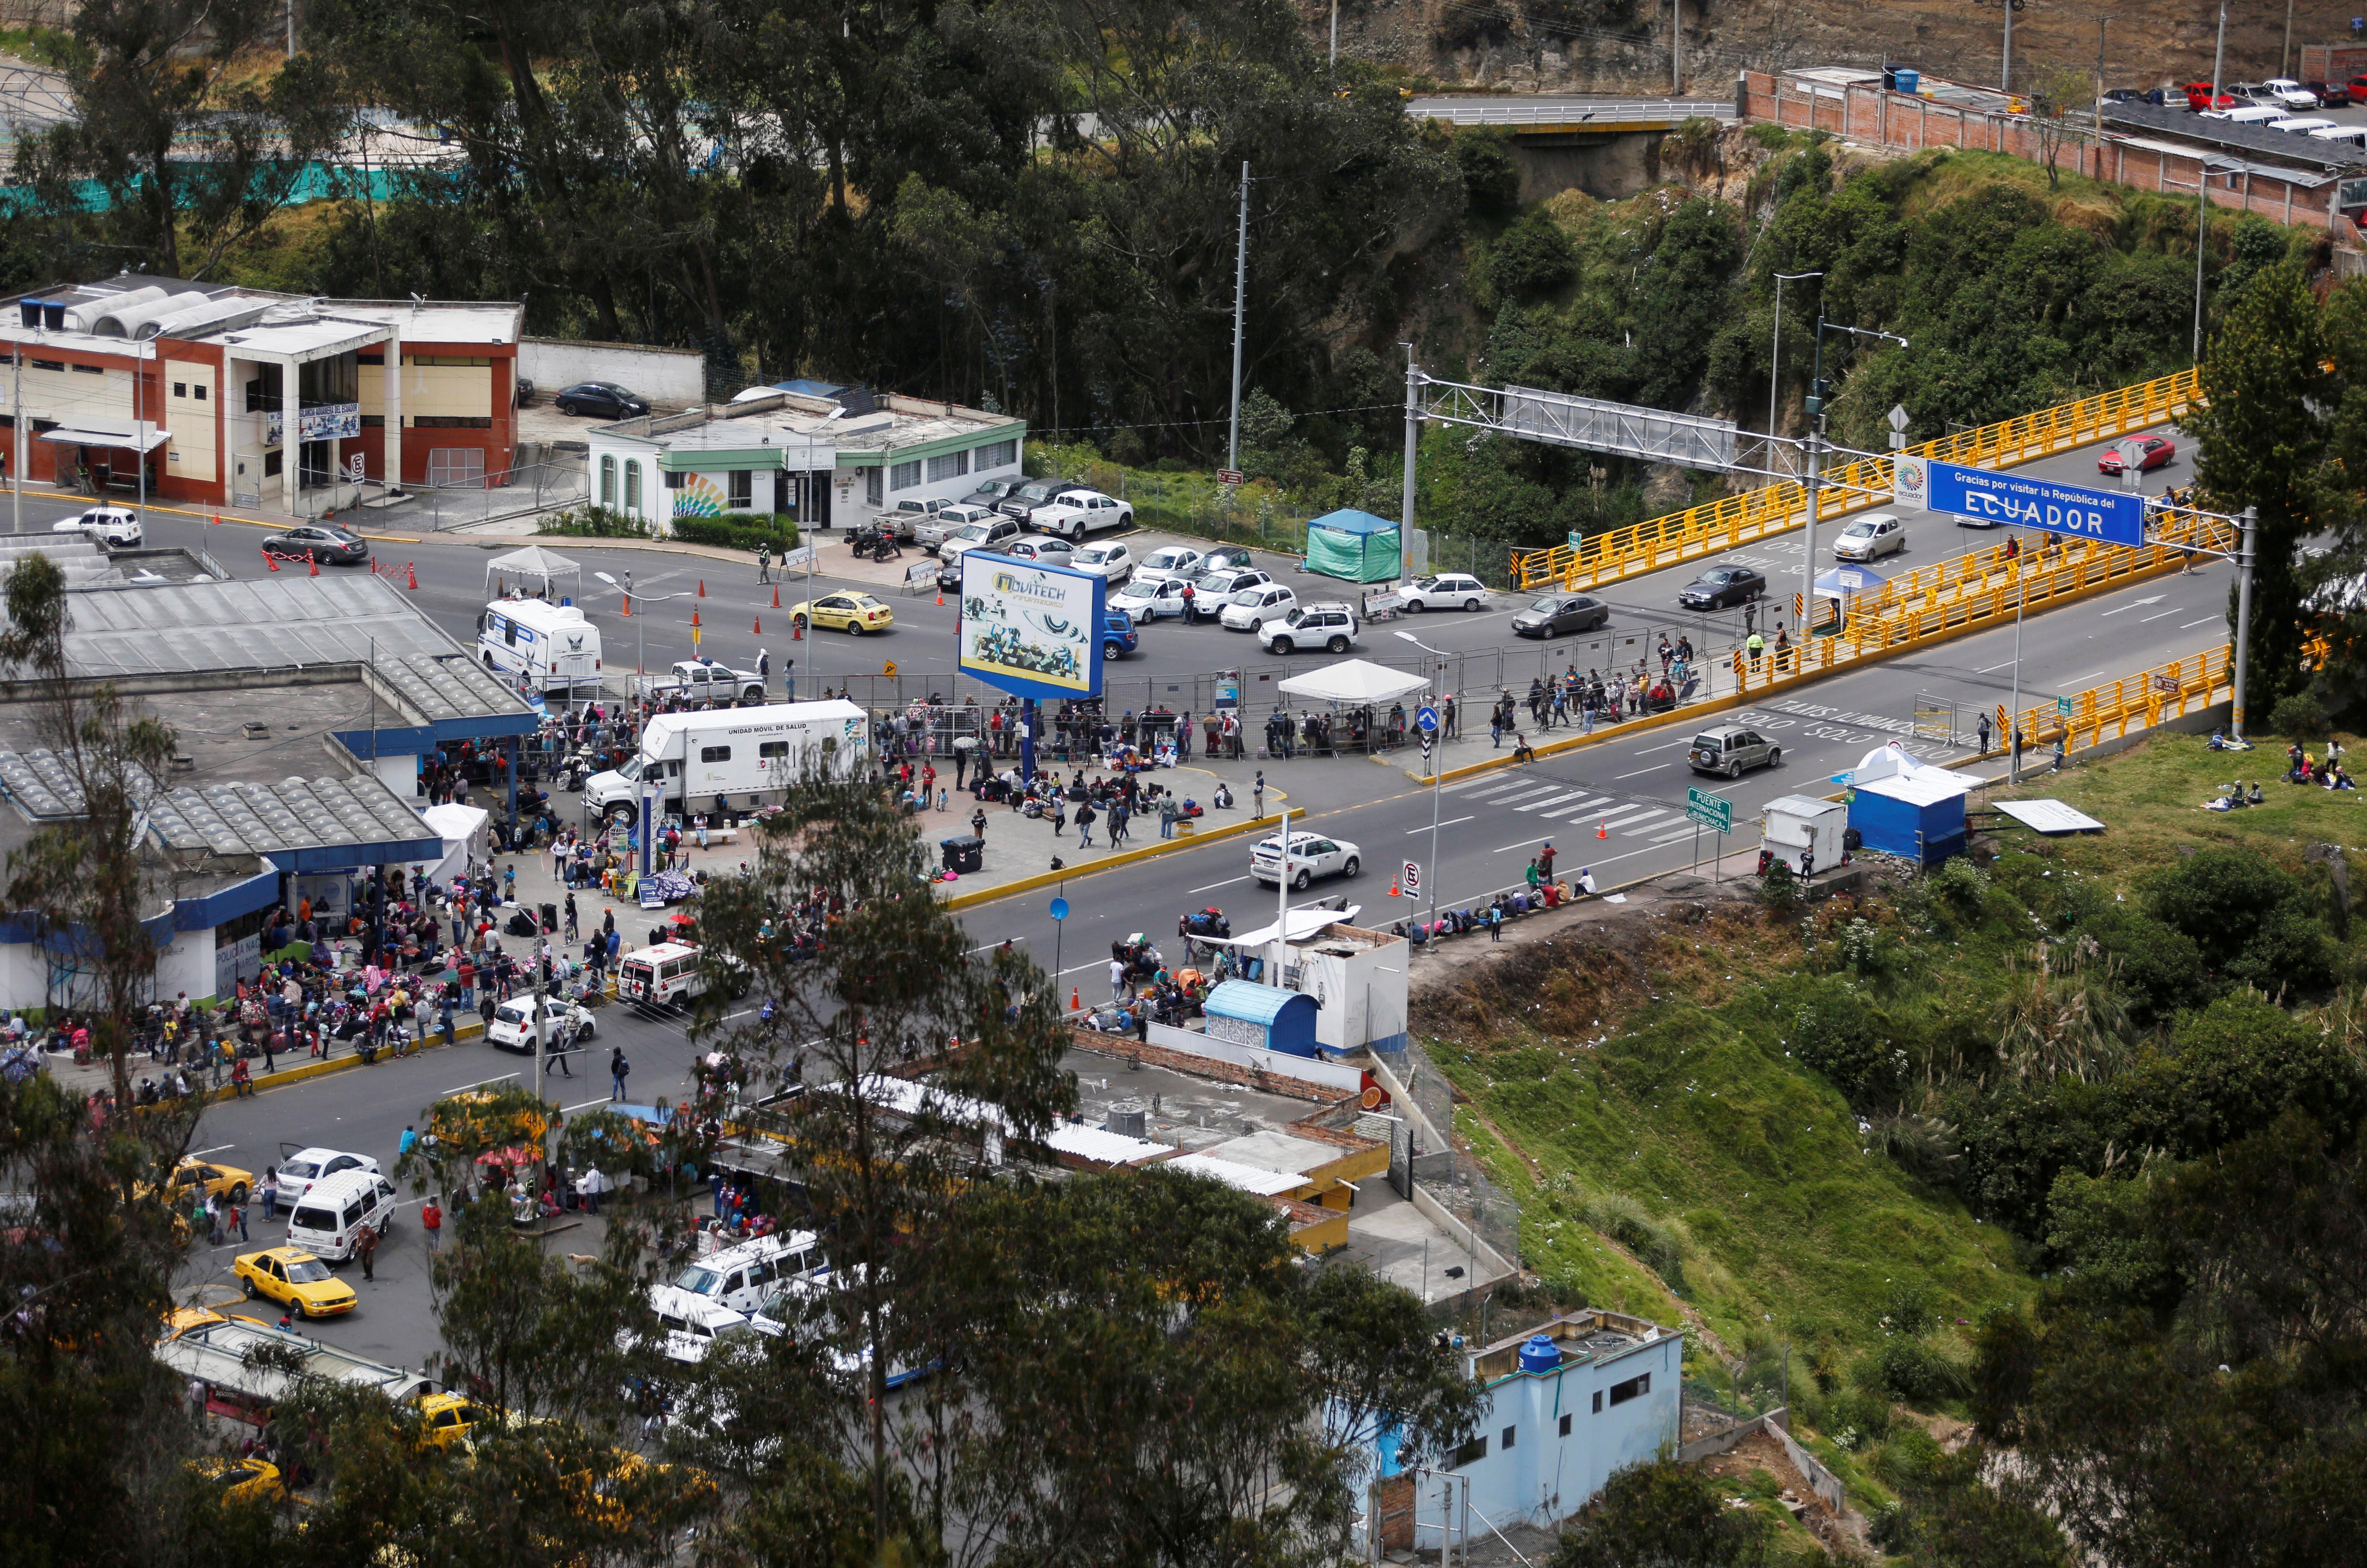 Venezuelan migrants flood into Ecuador ahead of new visa restrictions